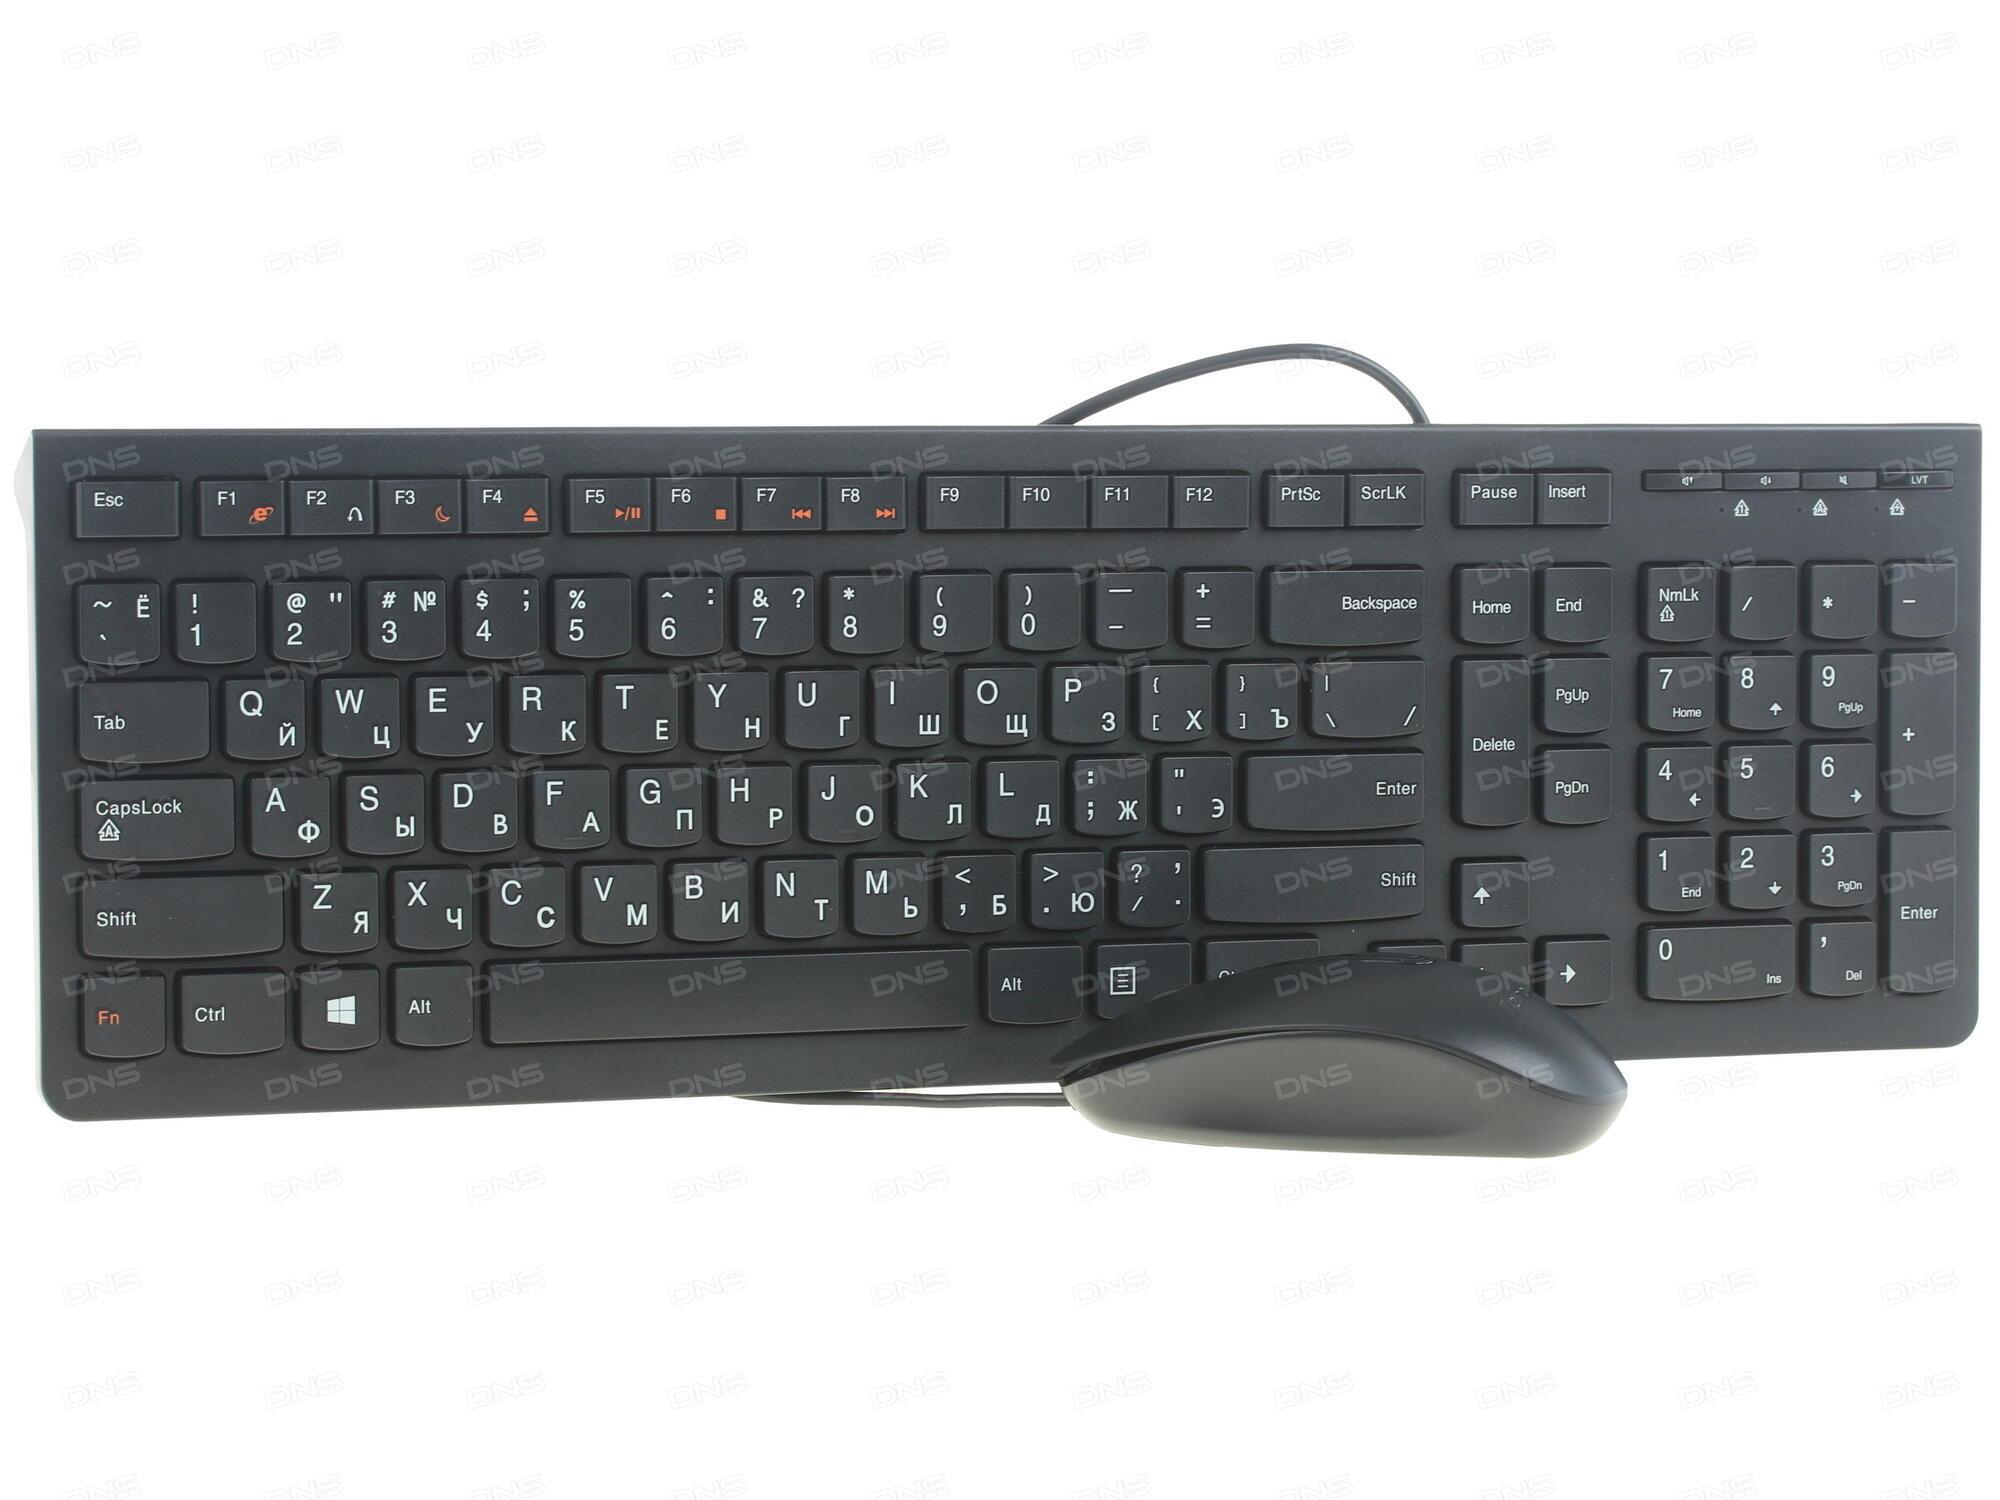 Моноблок Acer Aspire Z24-880 (DQ.B8TER.014) i7-7700T (2.9)/16GB/2TB+16GB SSD/23.8